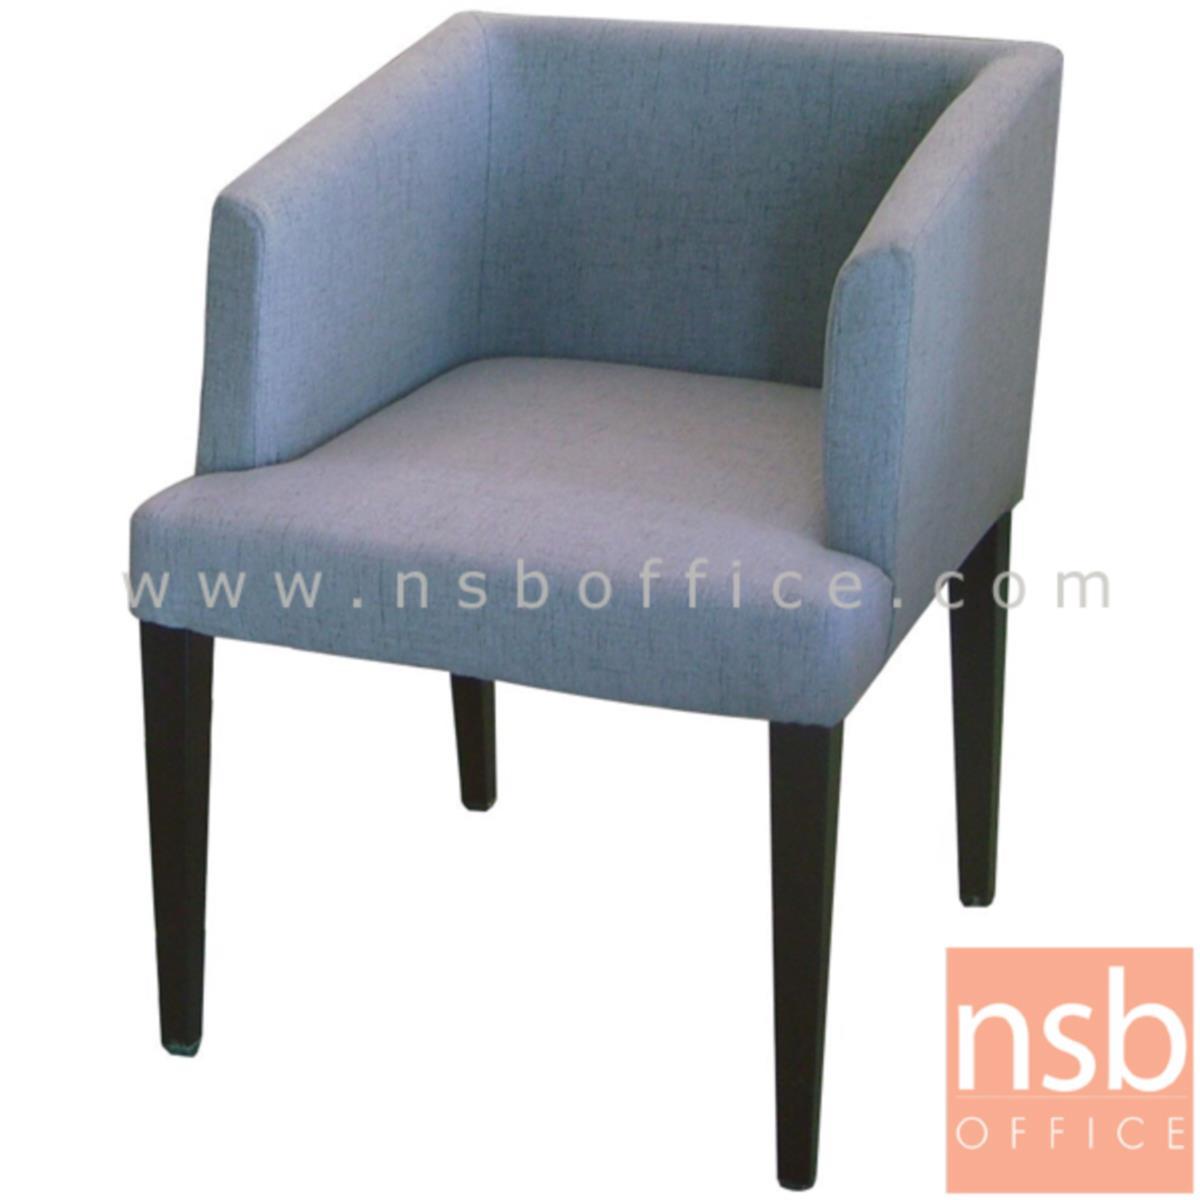 B29A293:เก้าอี้โมเดิร์นหุ้มผ้า รุ่น Colton (คอลตัน) ขนาด 55W cm. โครงขาไม้